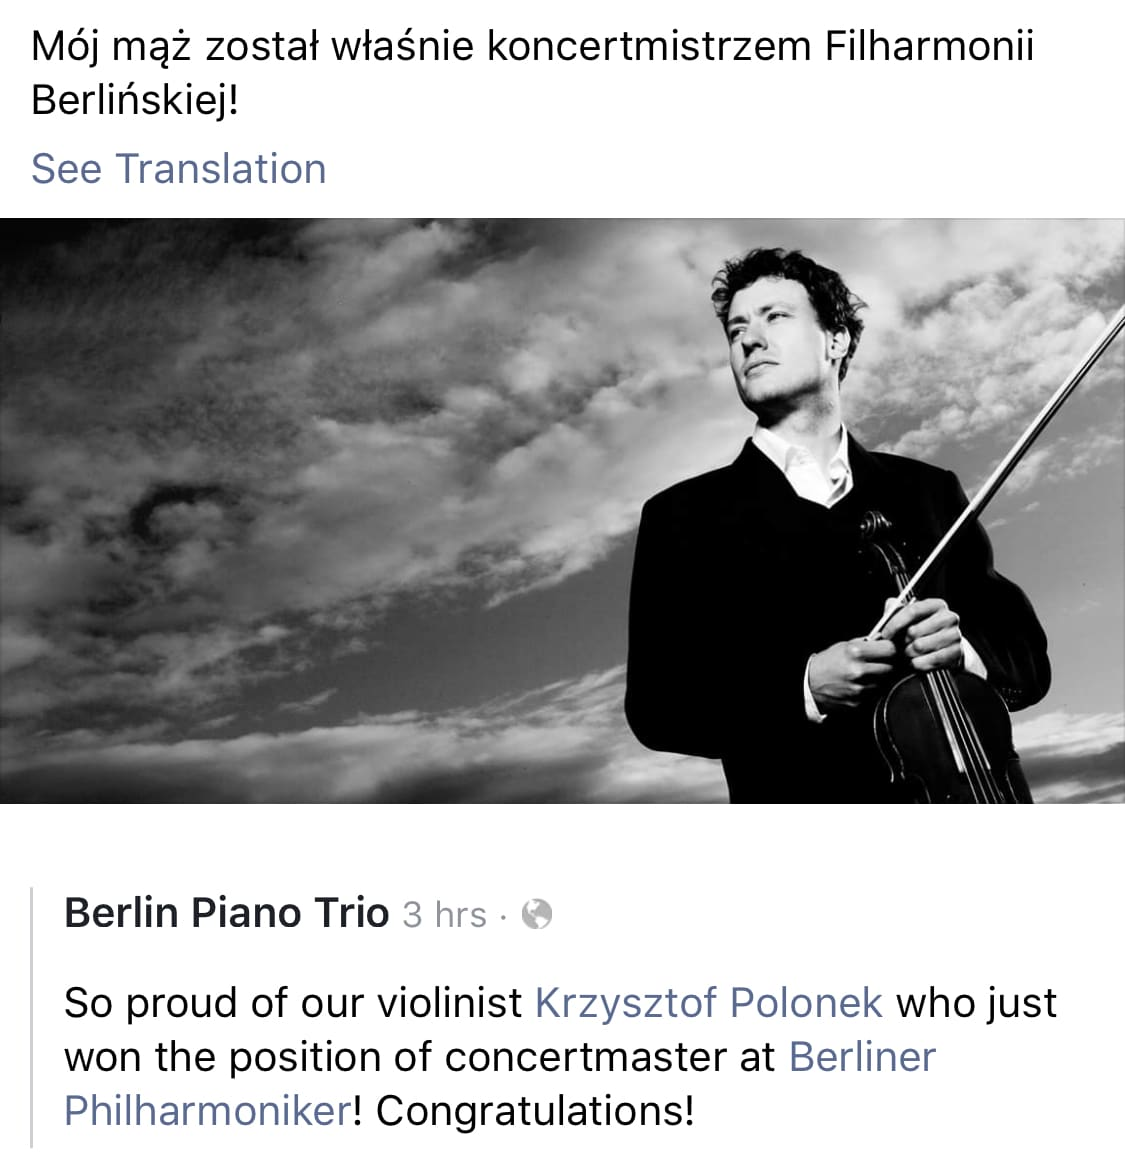 Berlin Phil confirms Polish concertmaster